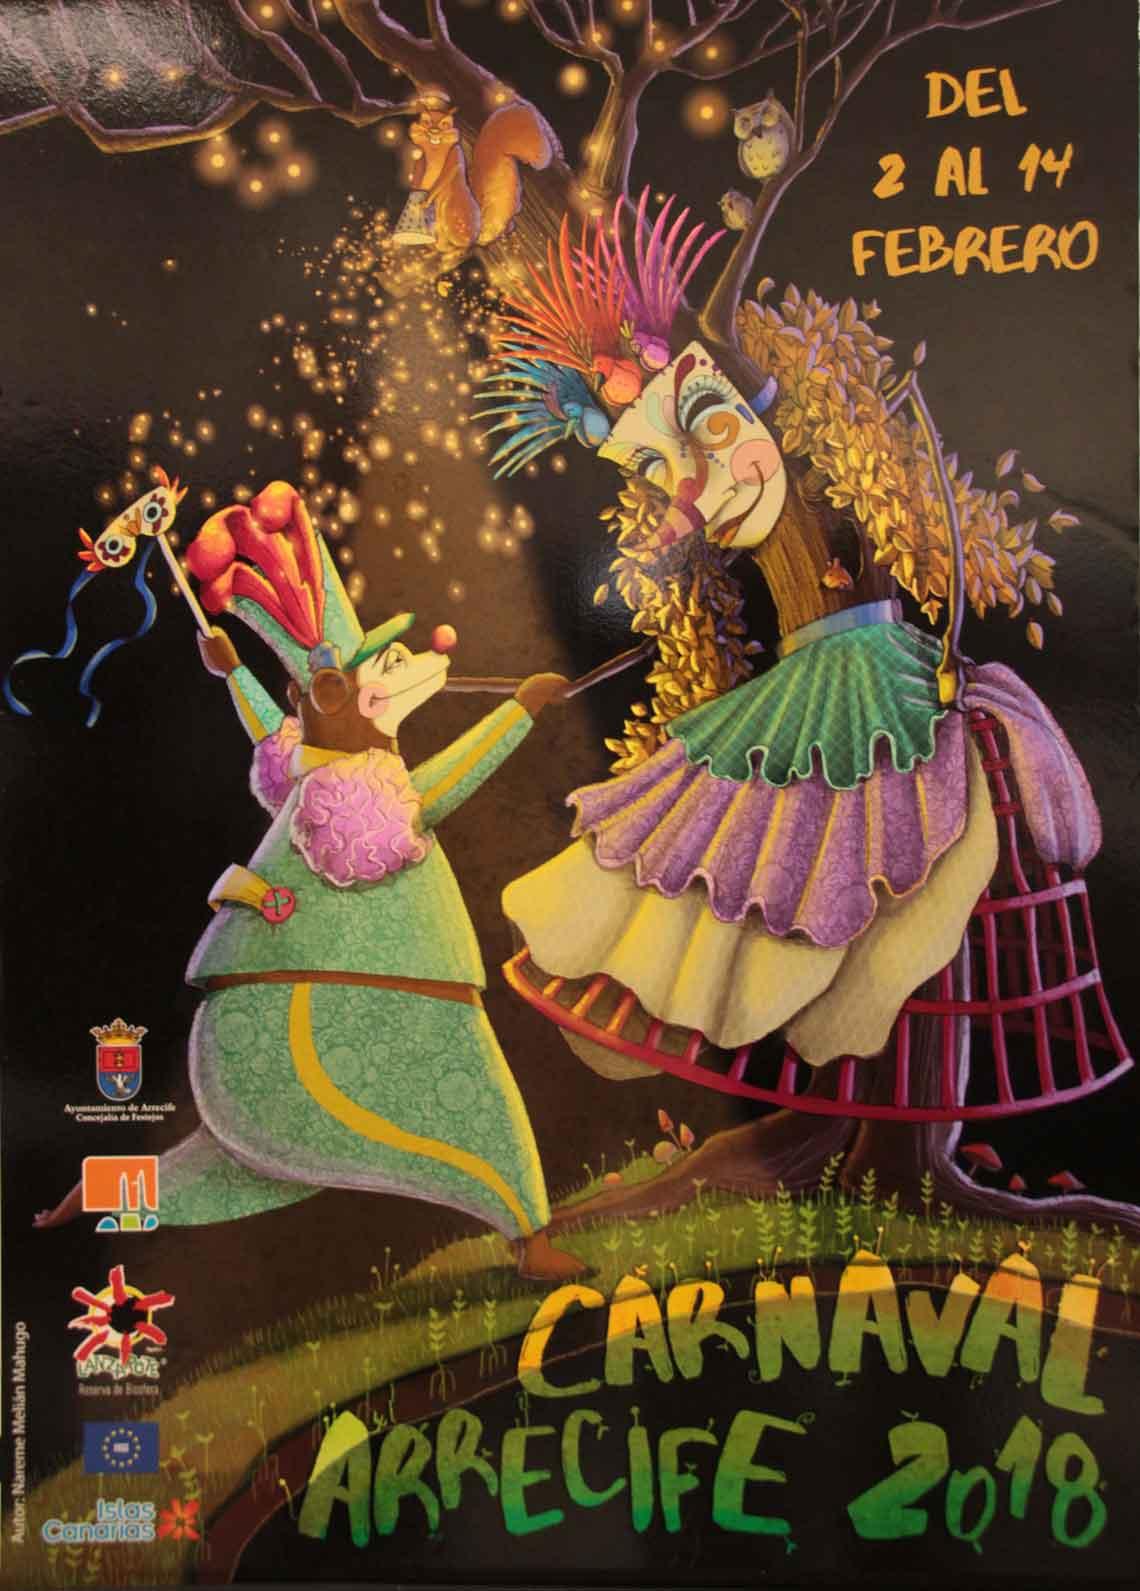 programa carnaval arrecife 2018